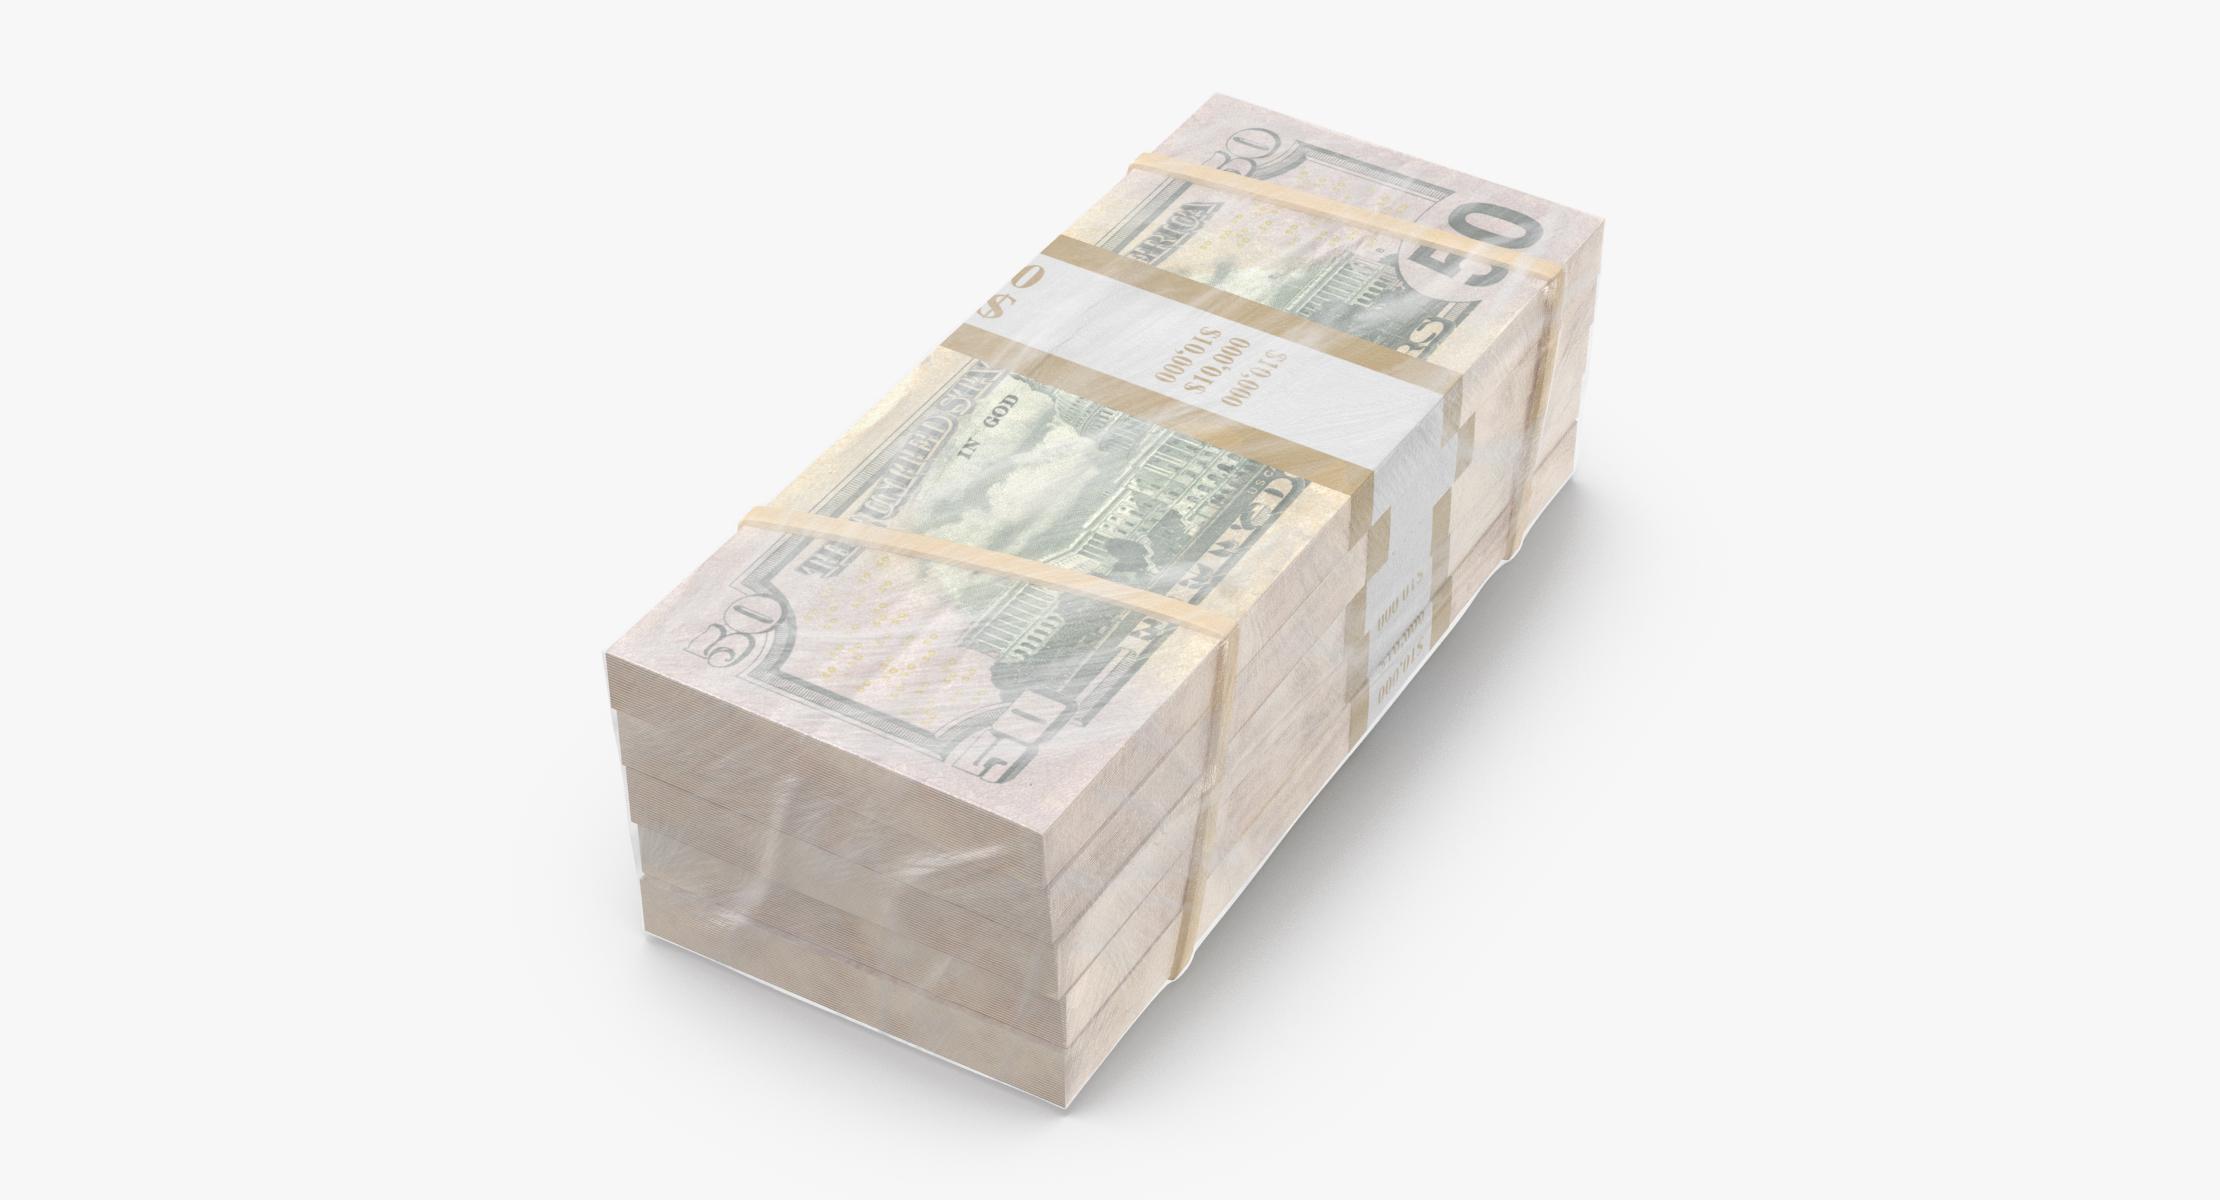 Wrapped Bills of Money - 50 Dollar Stacks 02 - reel 1